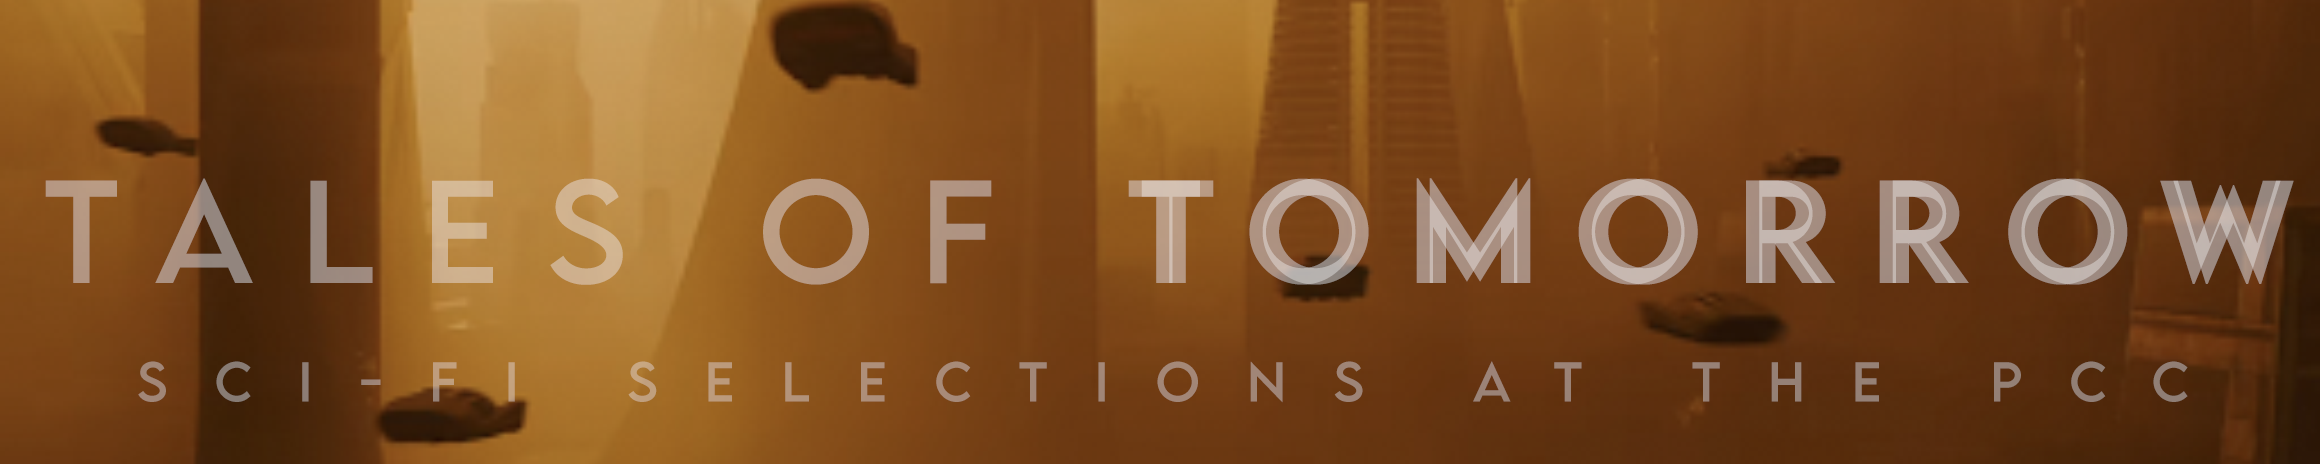 SCI-FI SELECTS